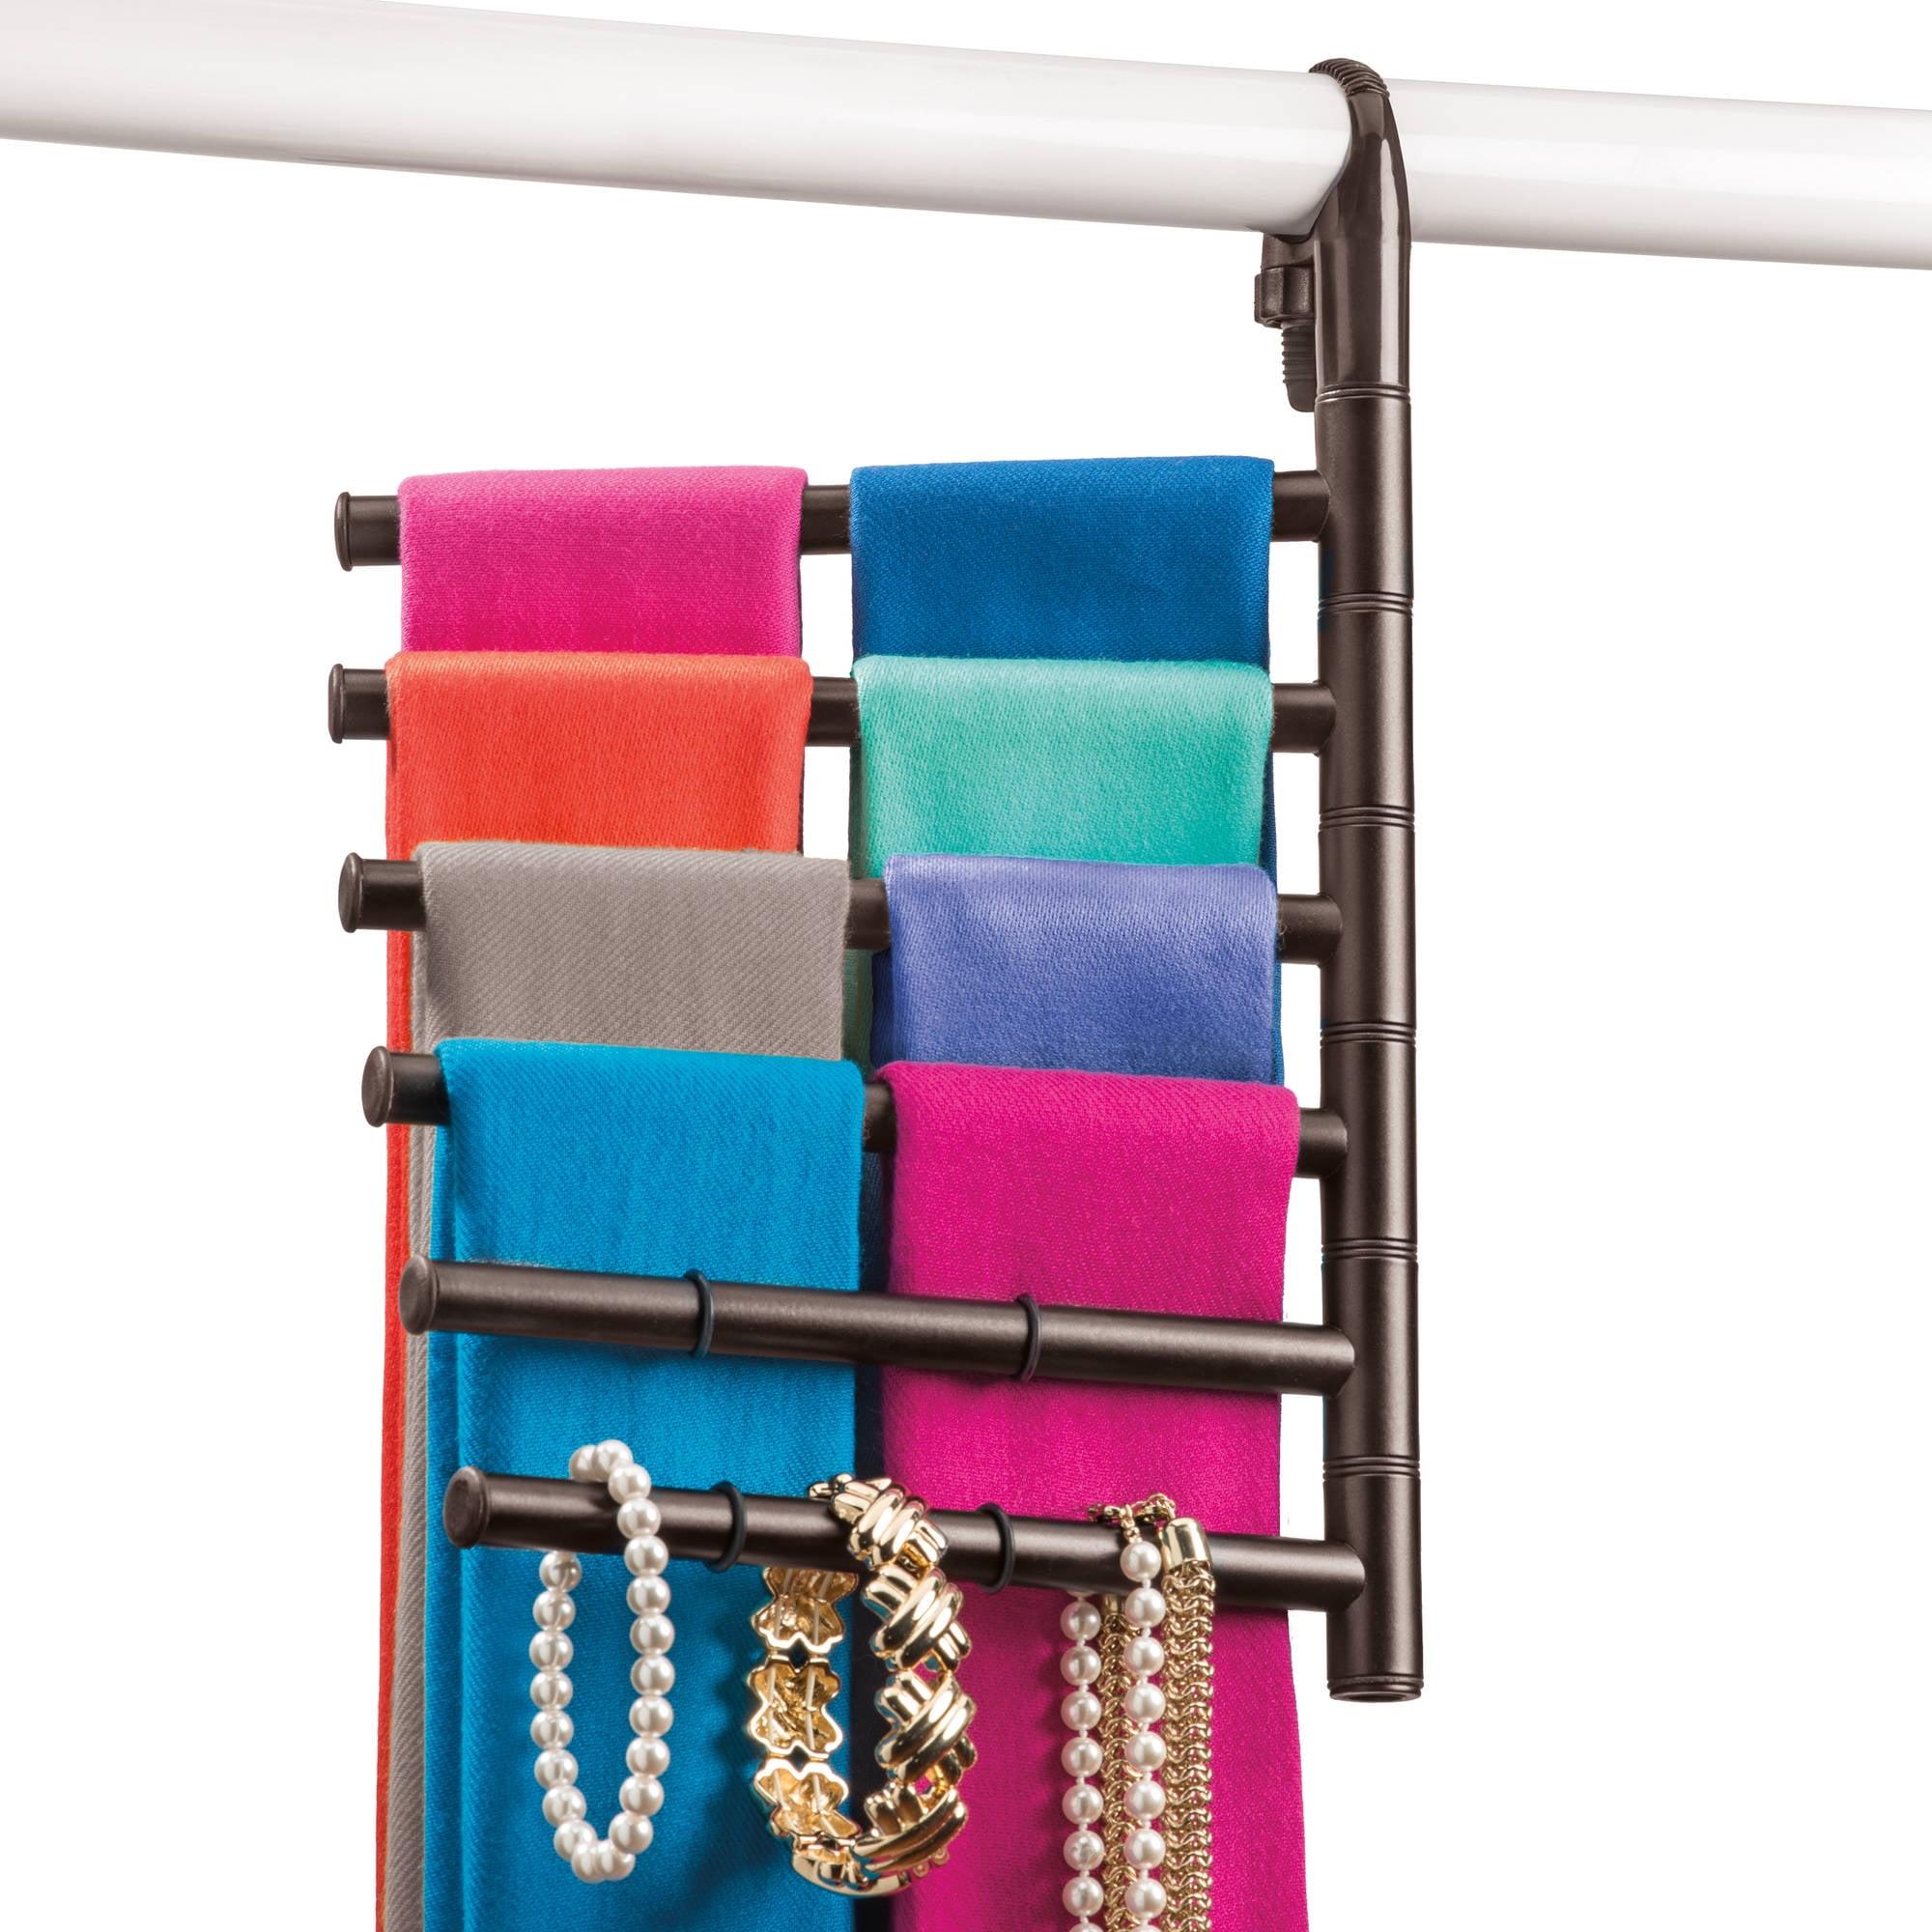 Lynk Hanging Pivoting Scarf Rack and Accessory Holder, Closet Hanger Organizer Rack, Bronze